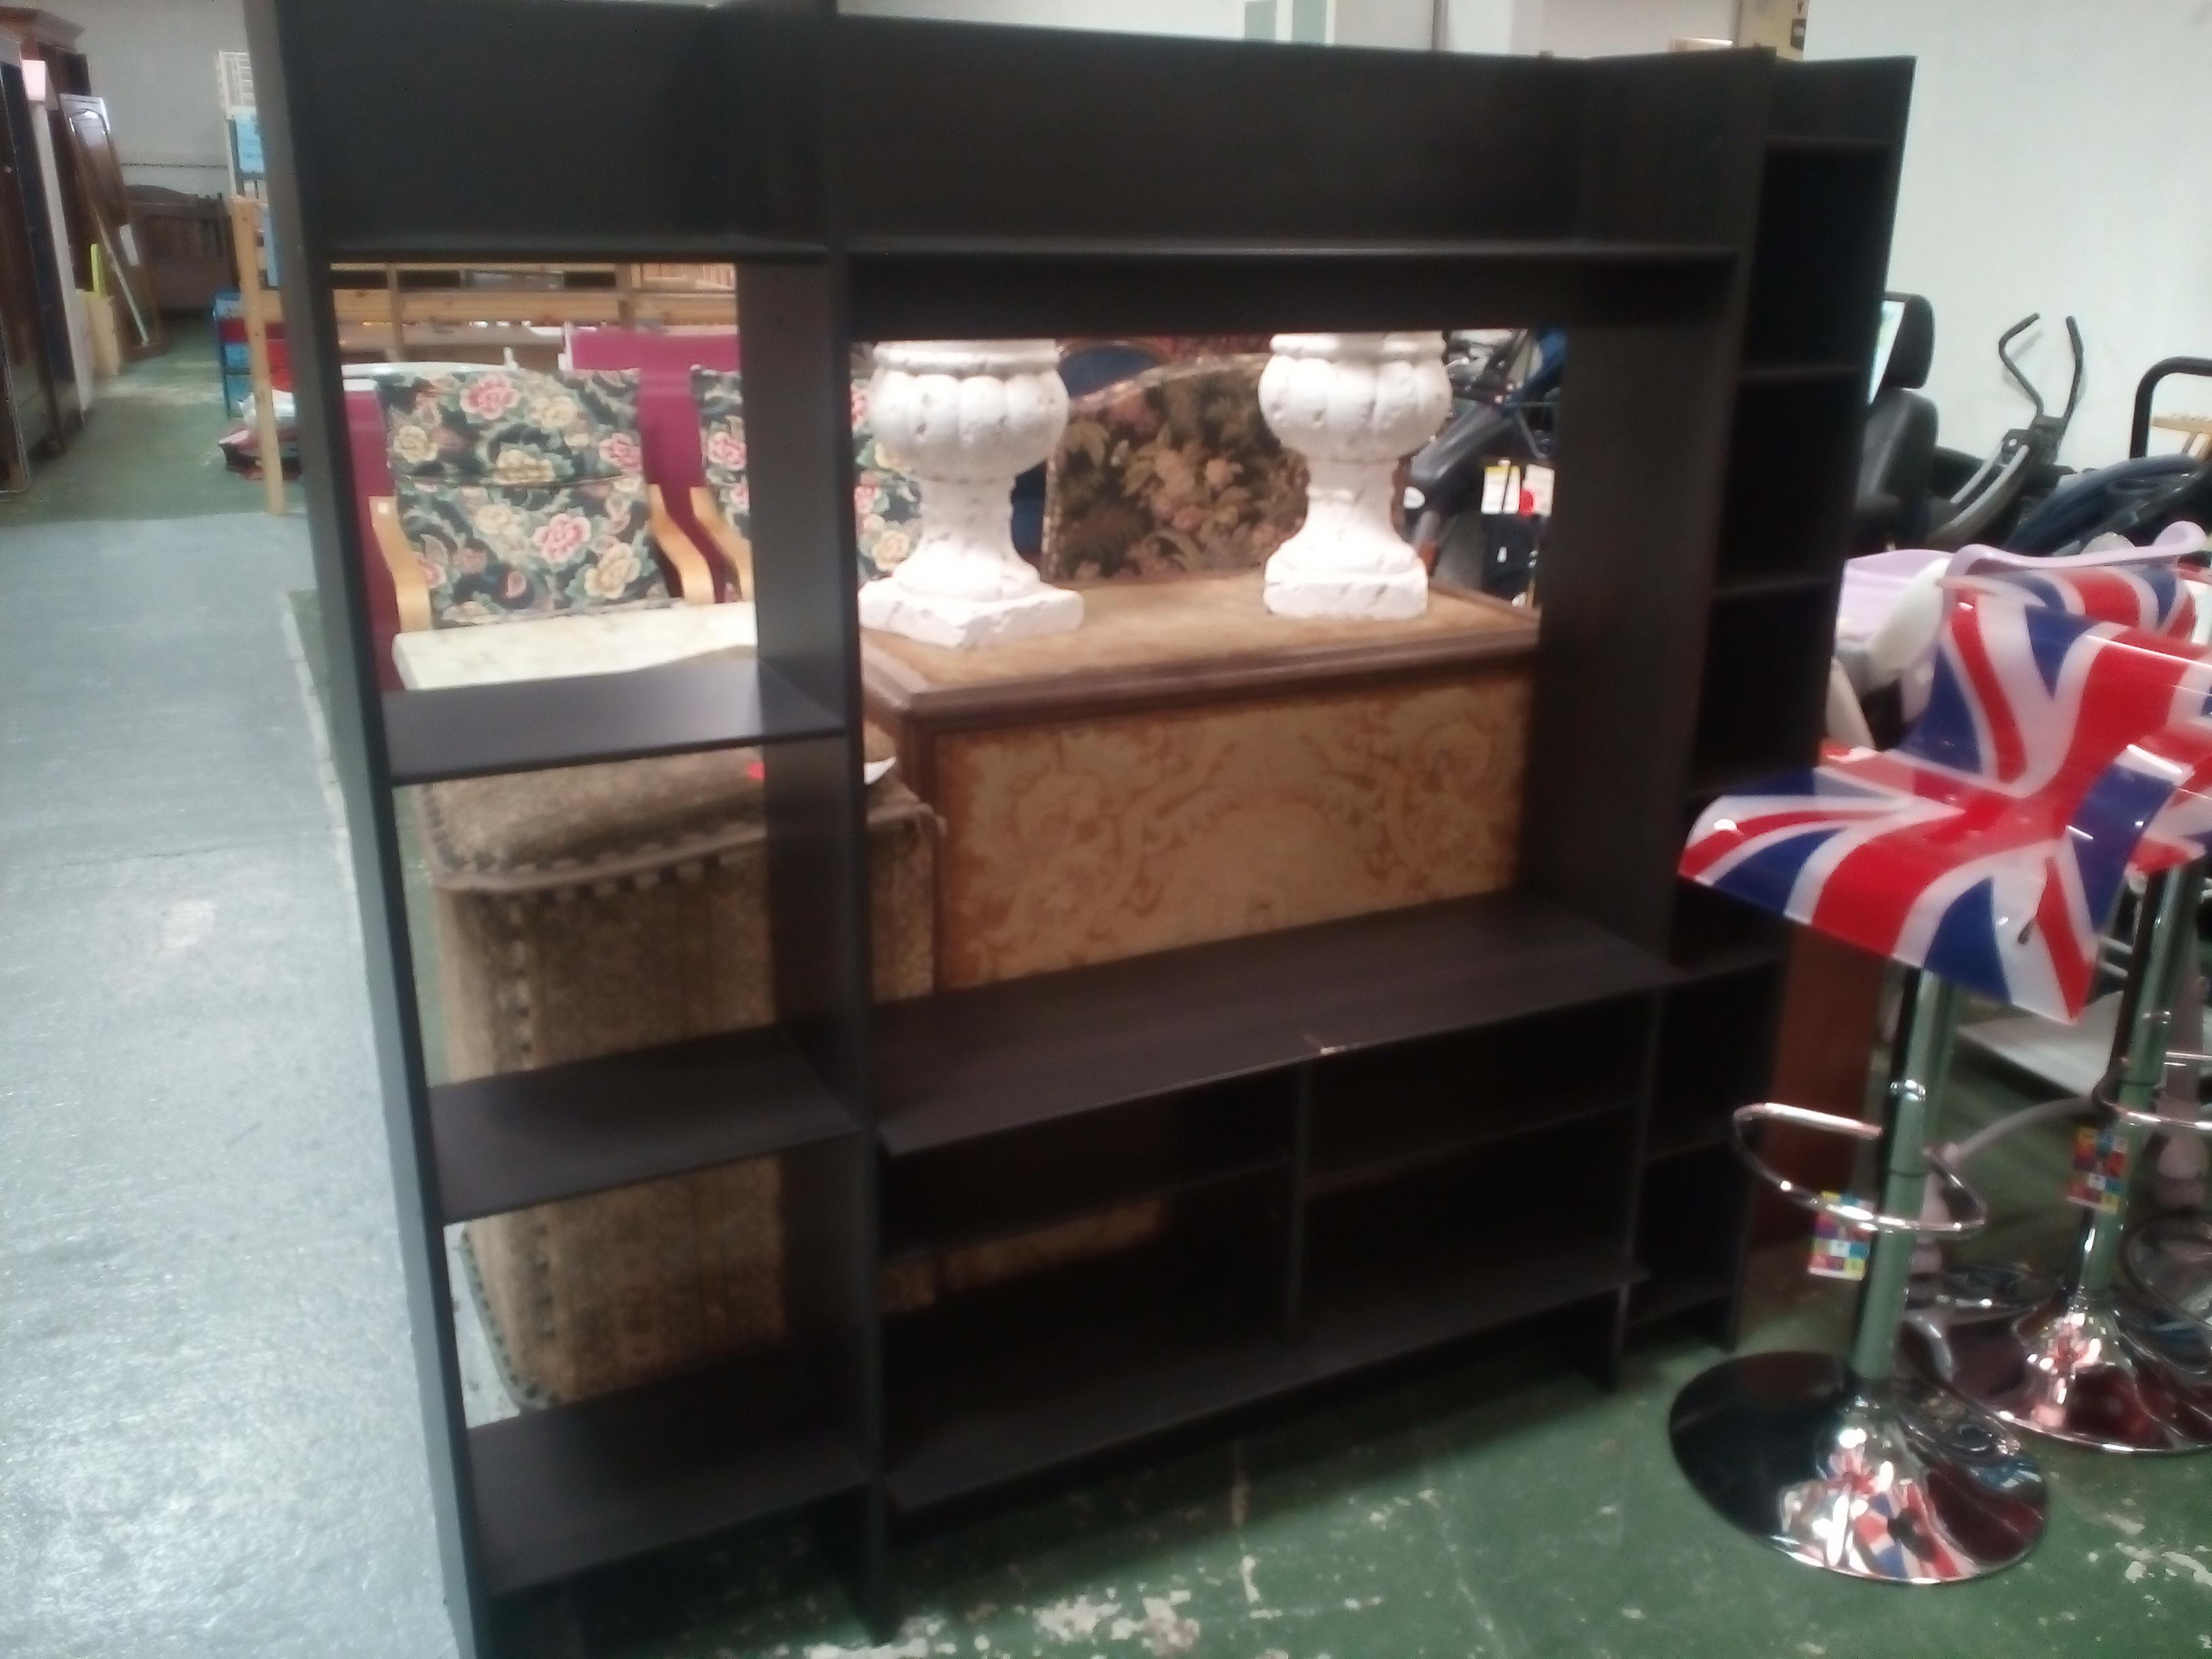 depot vente meubles paris atelier elisabeth vardasca rue. Black Bedroom Furniture Sets. Home Design Ideas